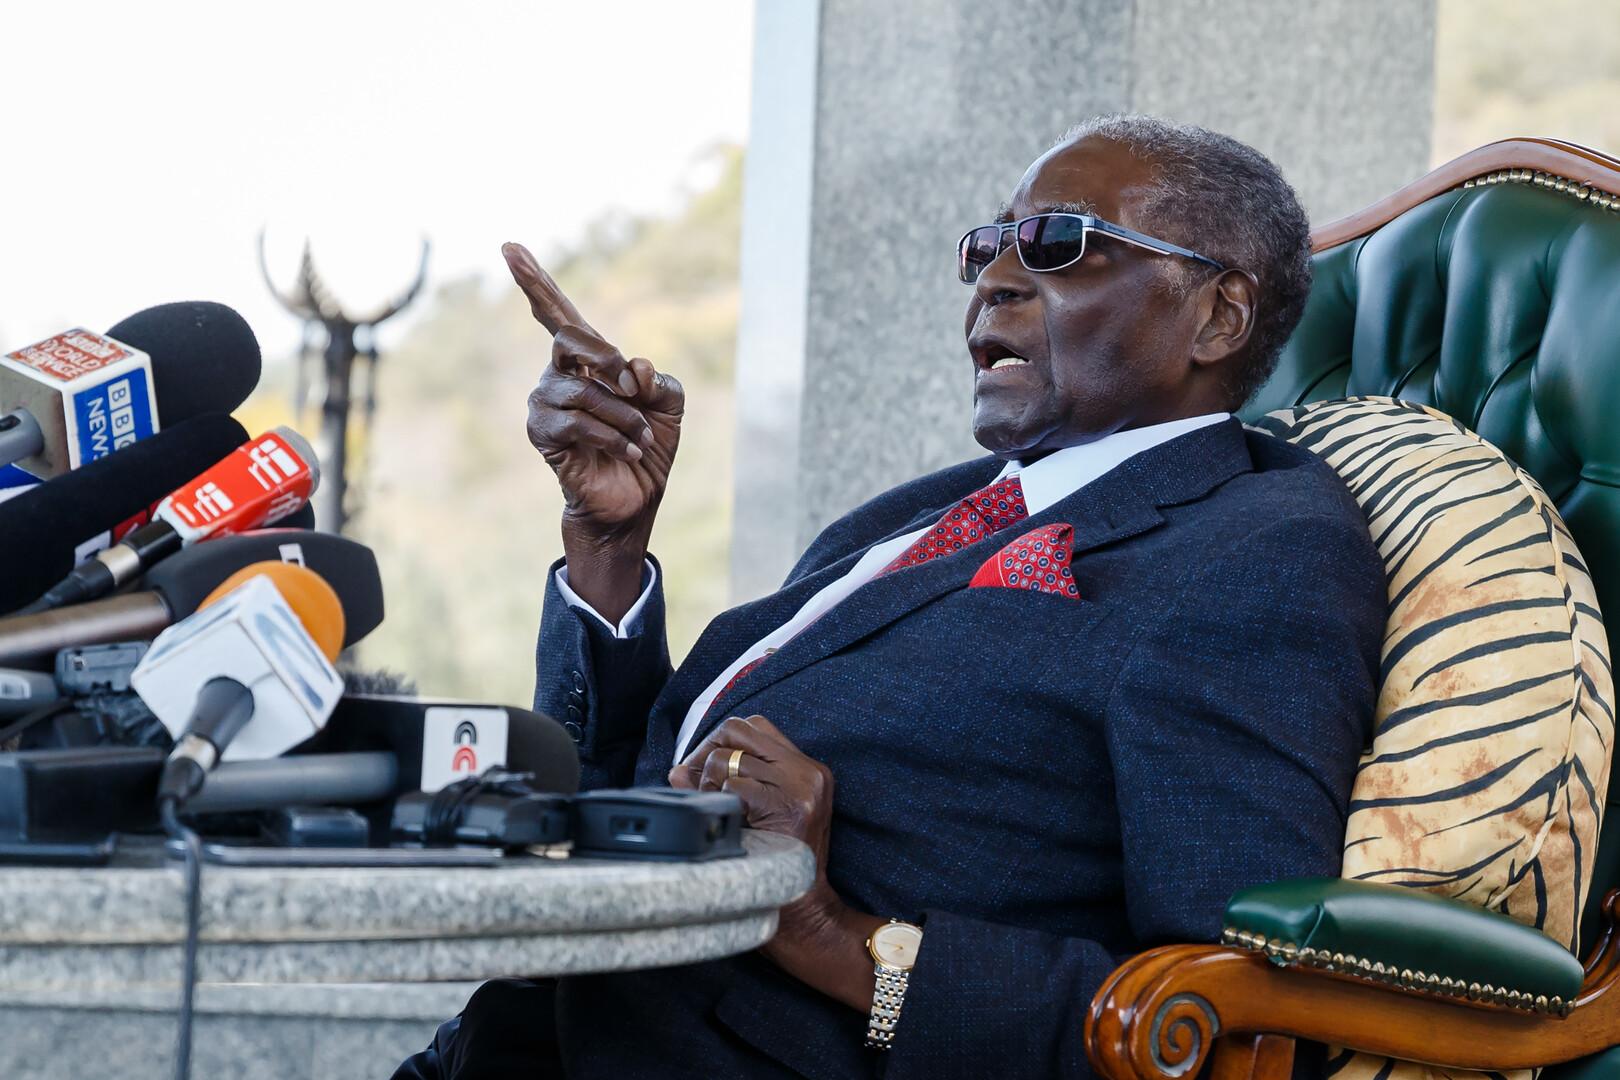 ومات موغابي حتف أنفه!